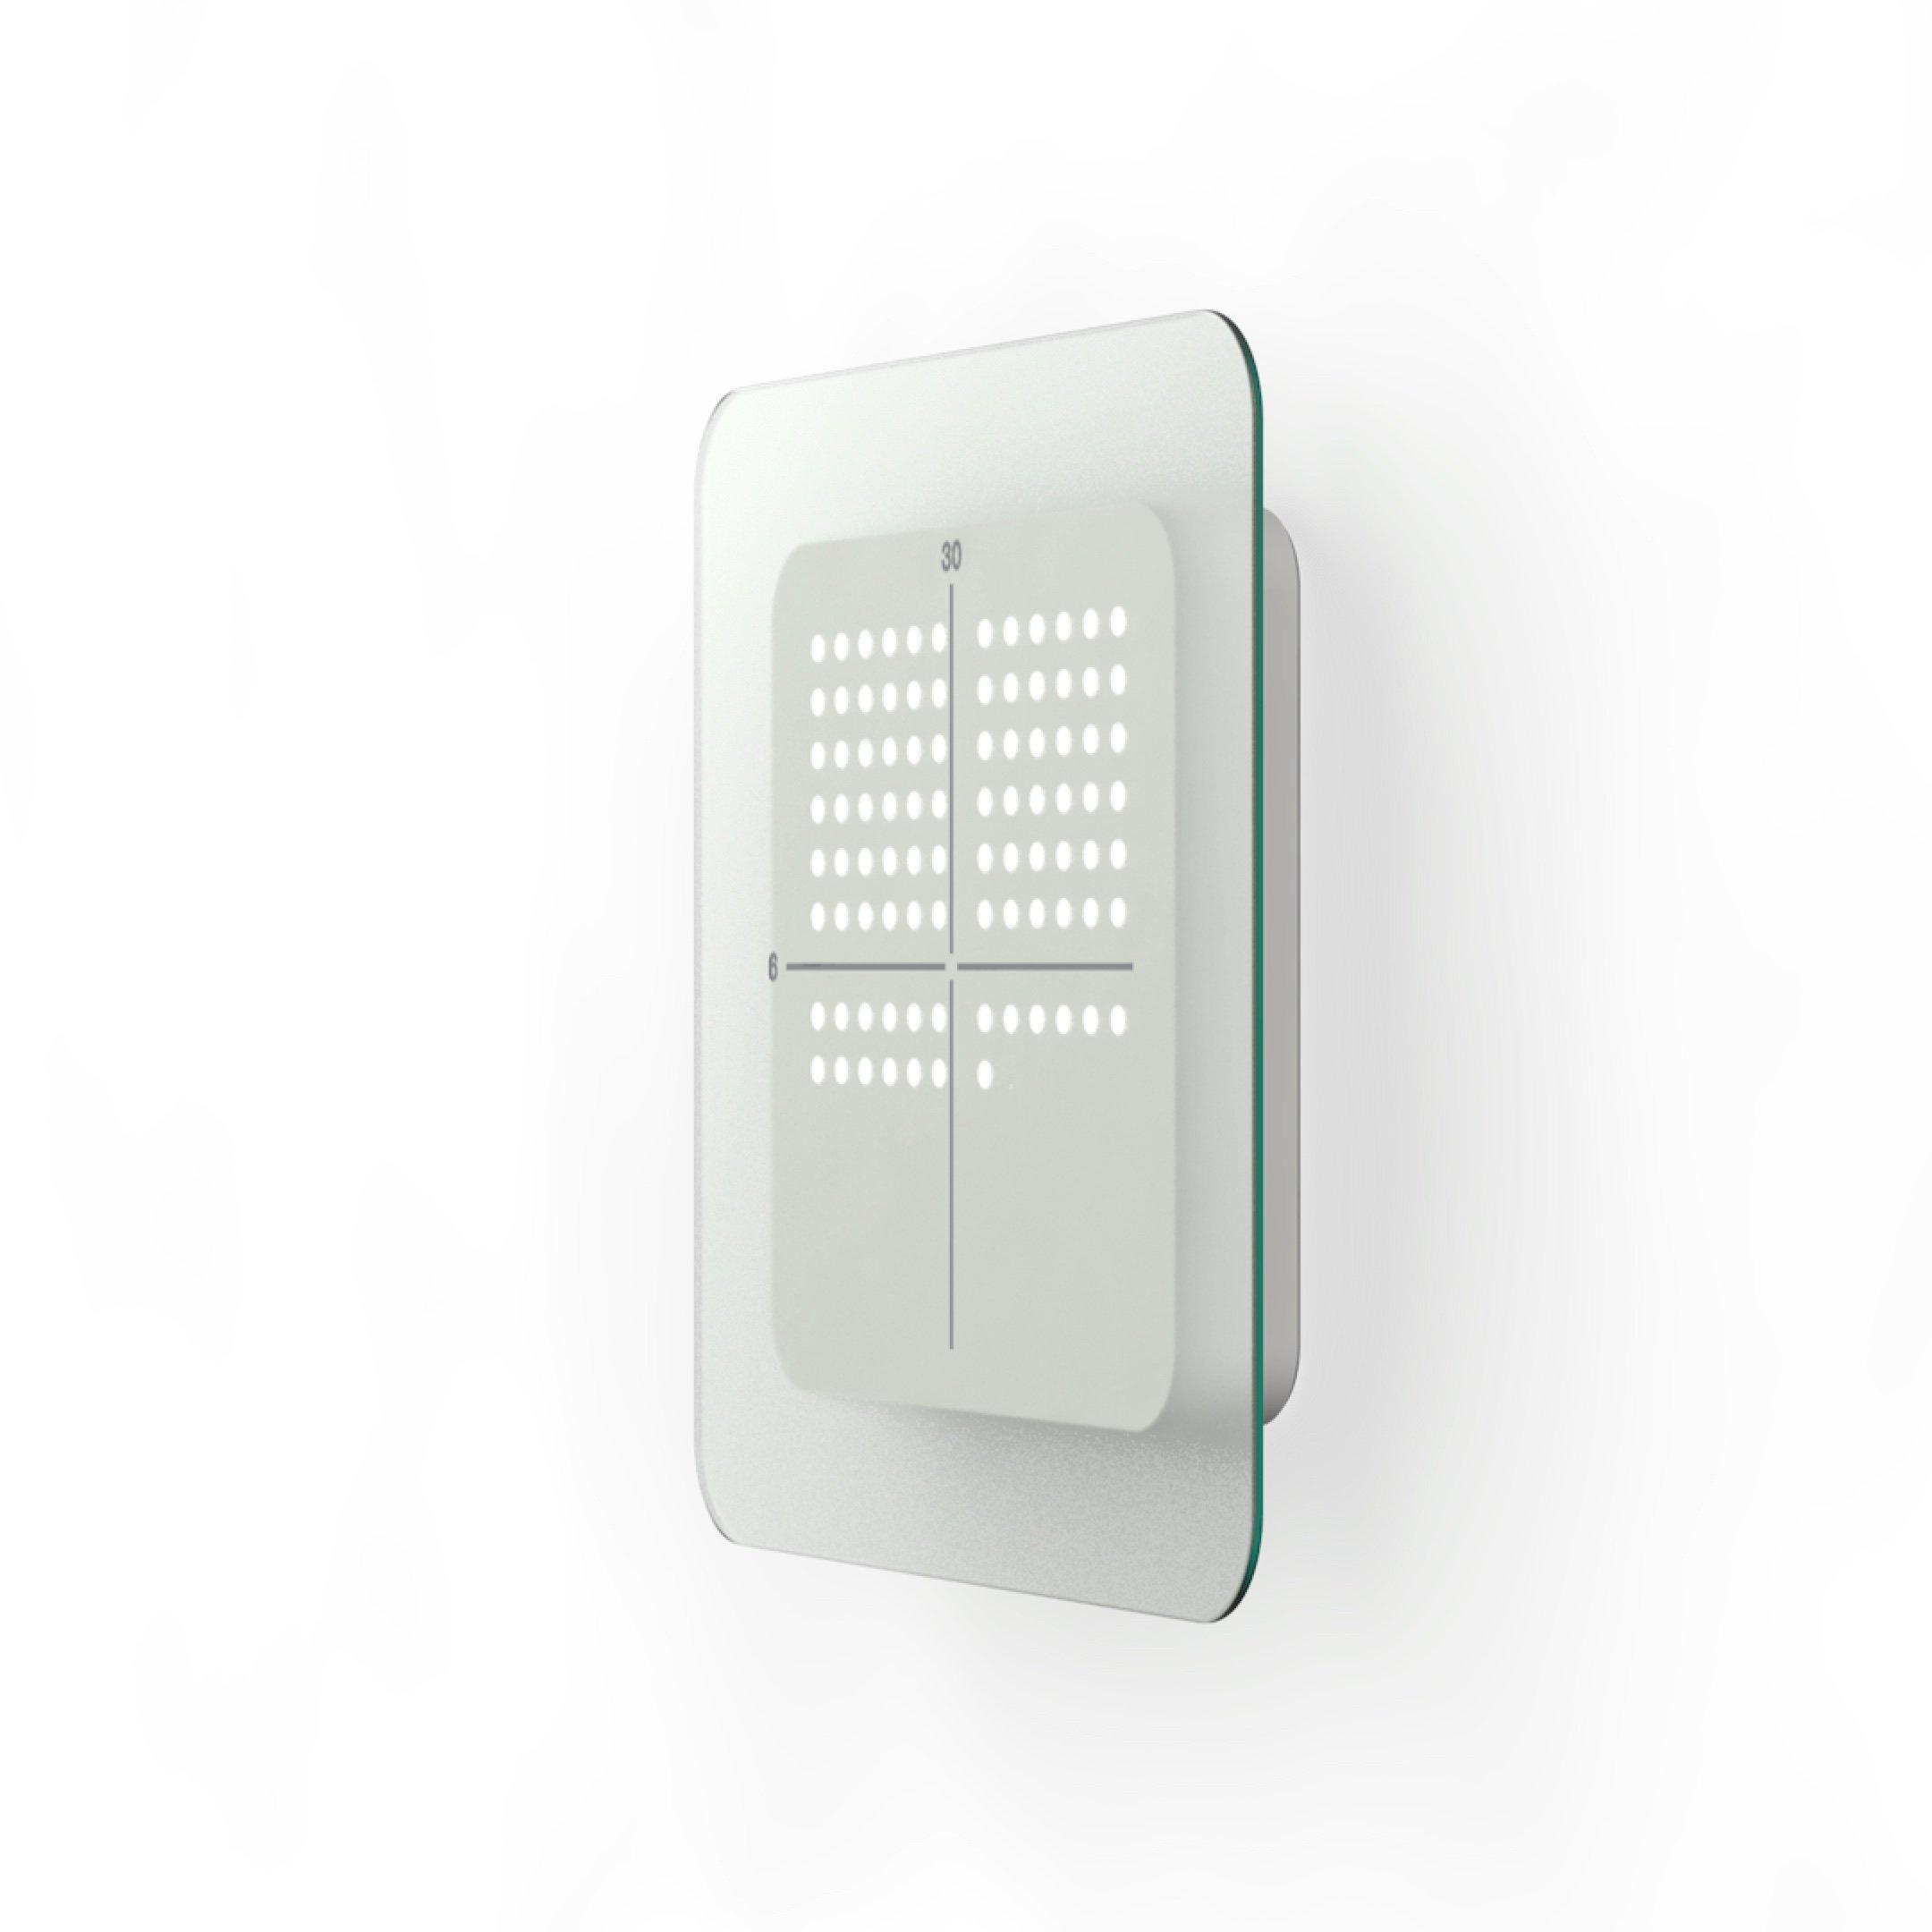 5min clock 時間の表現方法のコンセプト spect design